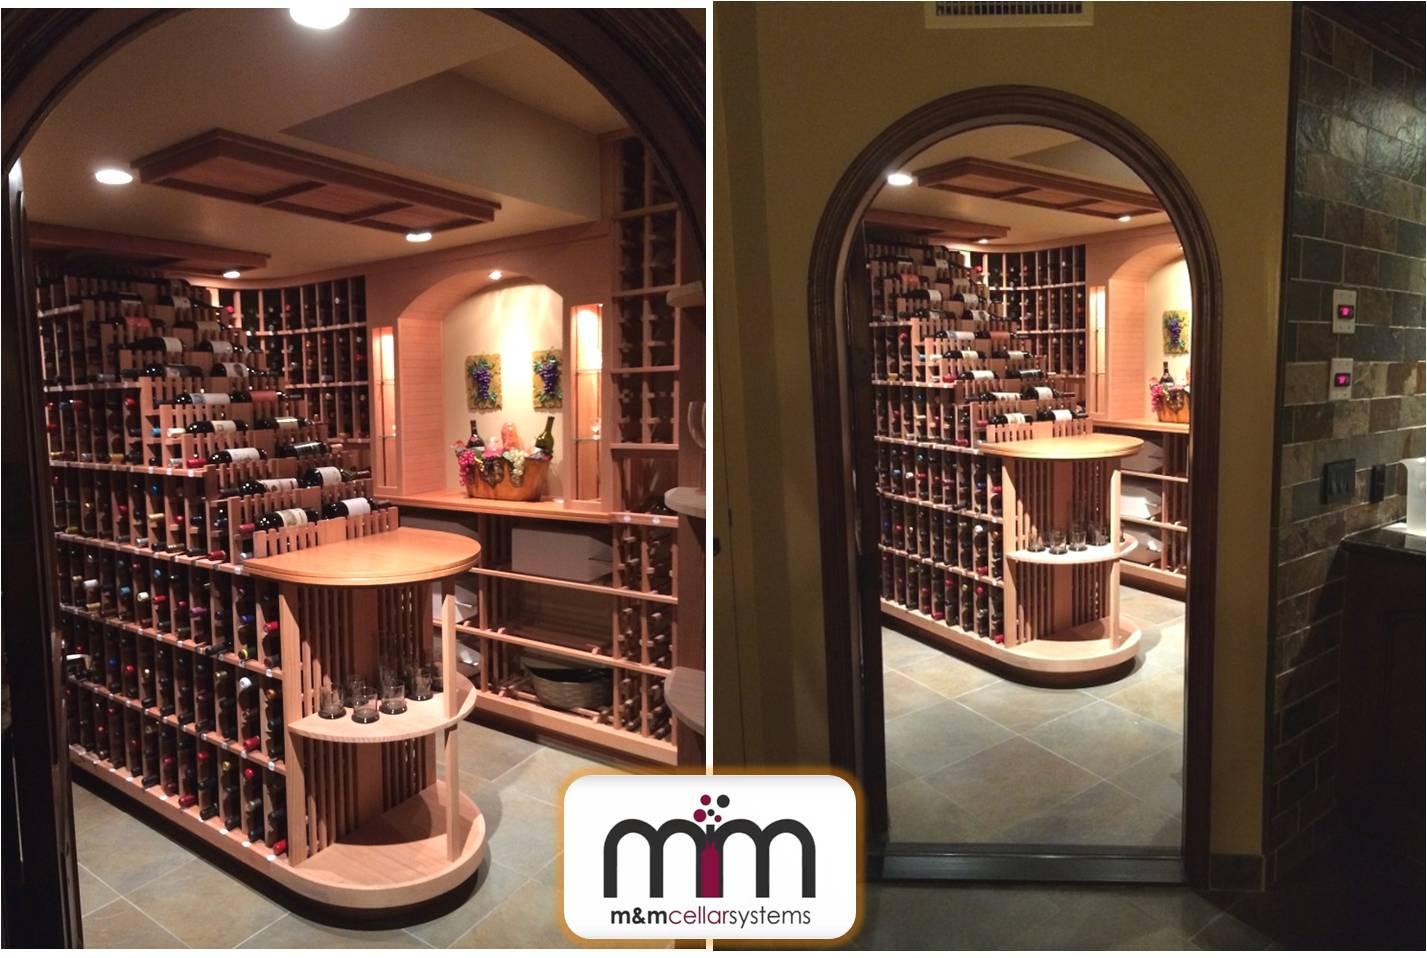 Wine Cellar Refrigeration Installation Project in Bel Air, Los Angeles, CA